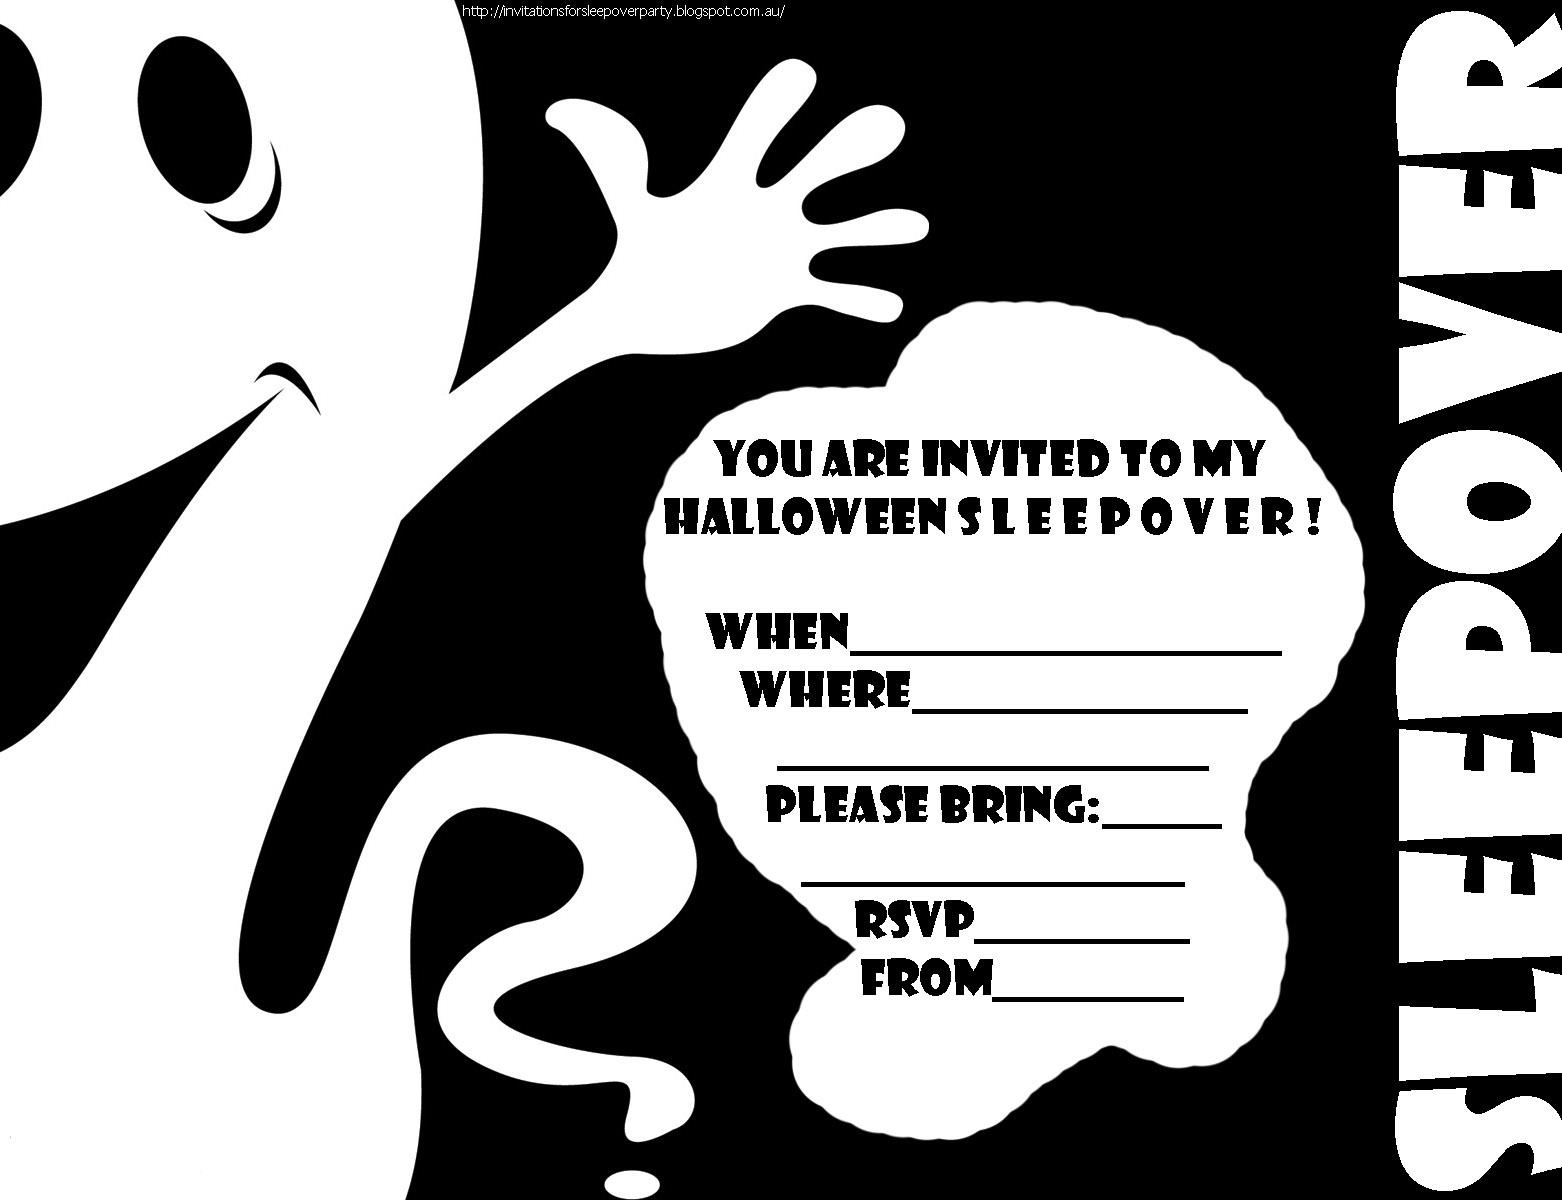 Modern Printable Halloween Birthday Invitations Images - Invitation - Halloween Invitations Free Printable Black And White